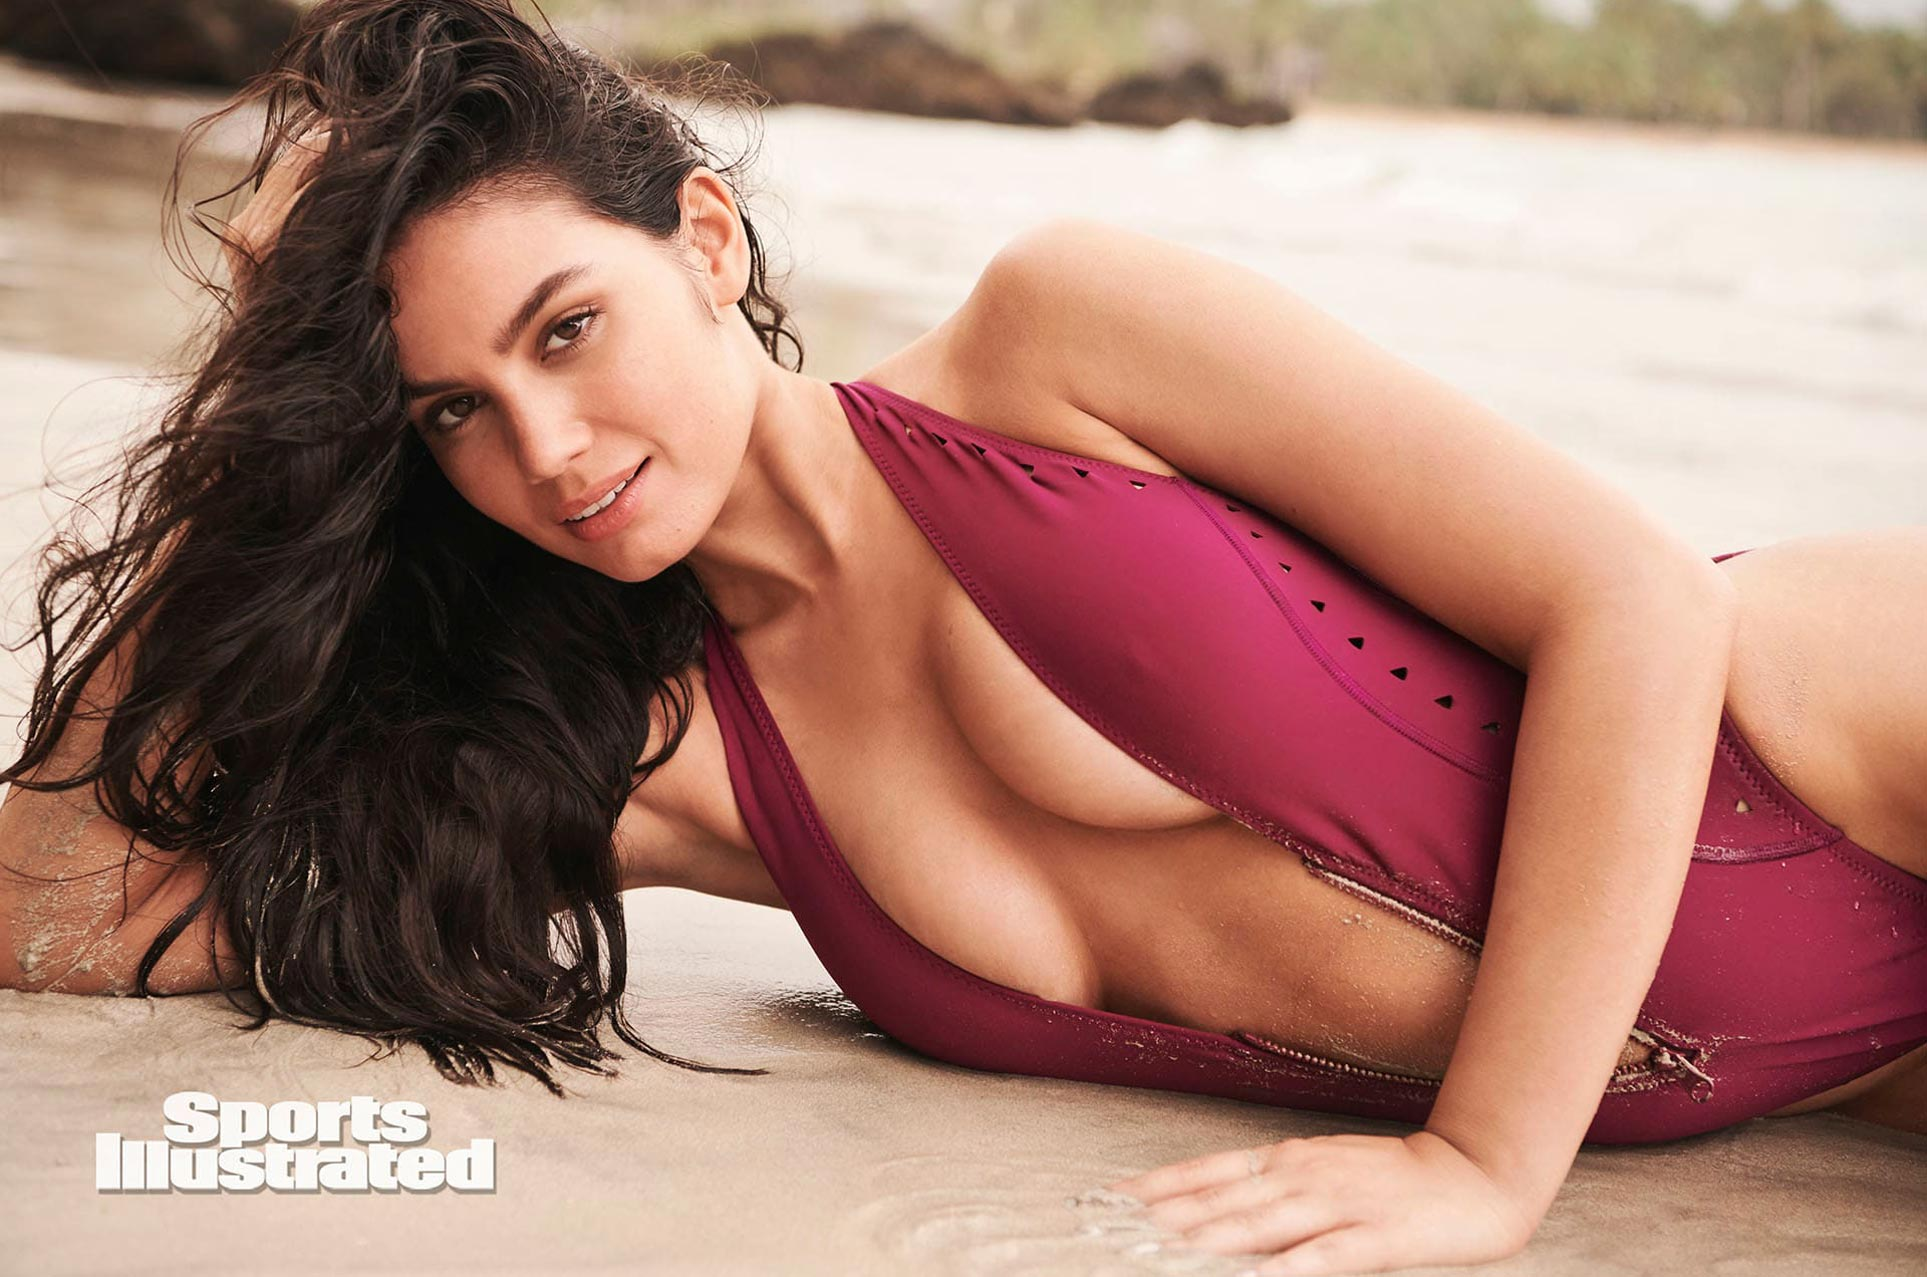 Энн де Паула в каталоге купальников Sports Illustrated Swimsuit 2020 / фото 04